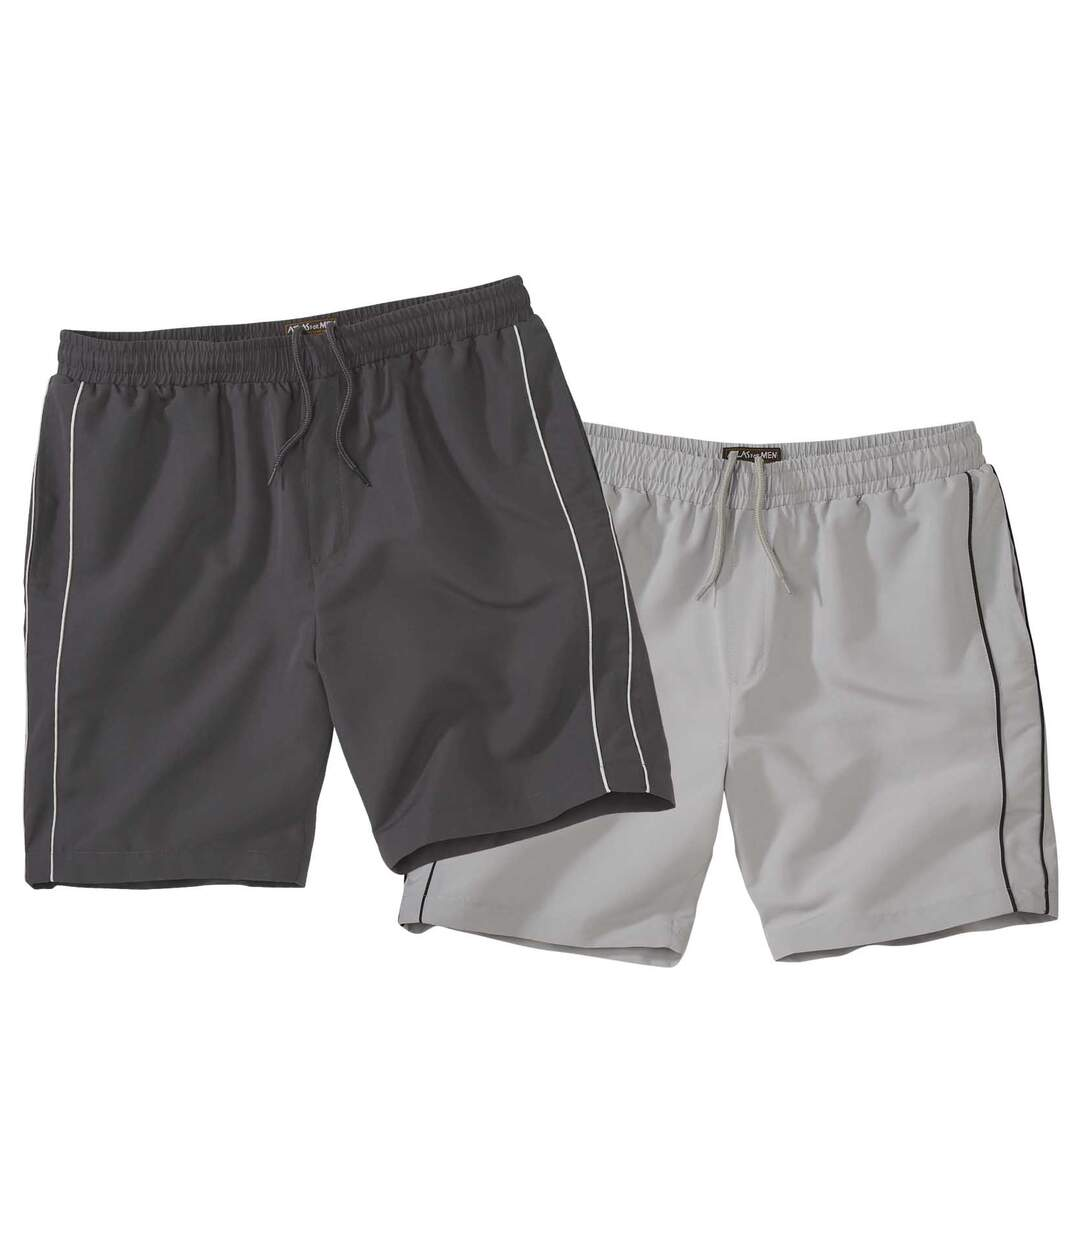 Set van 2 Sunny shorts van microvezel